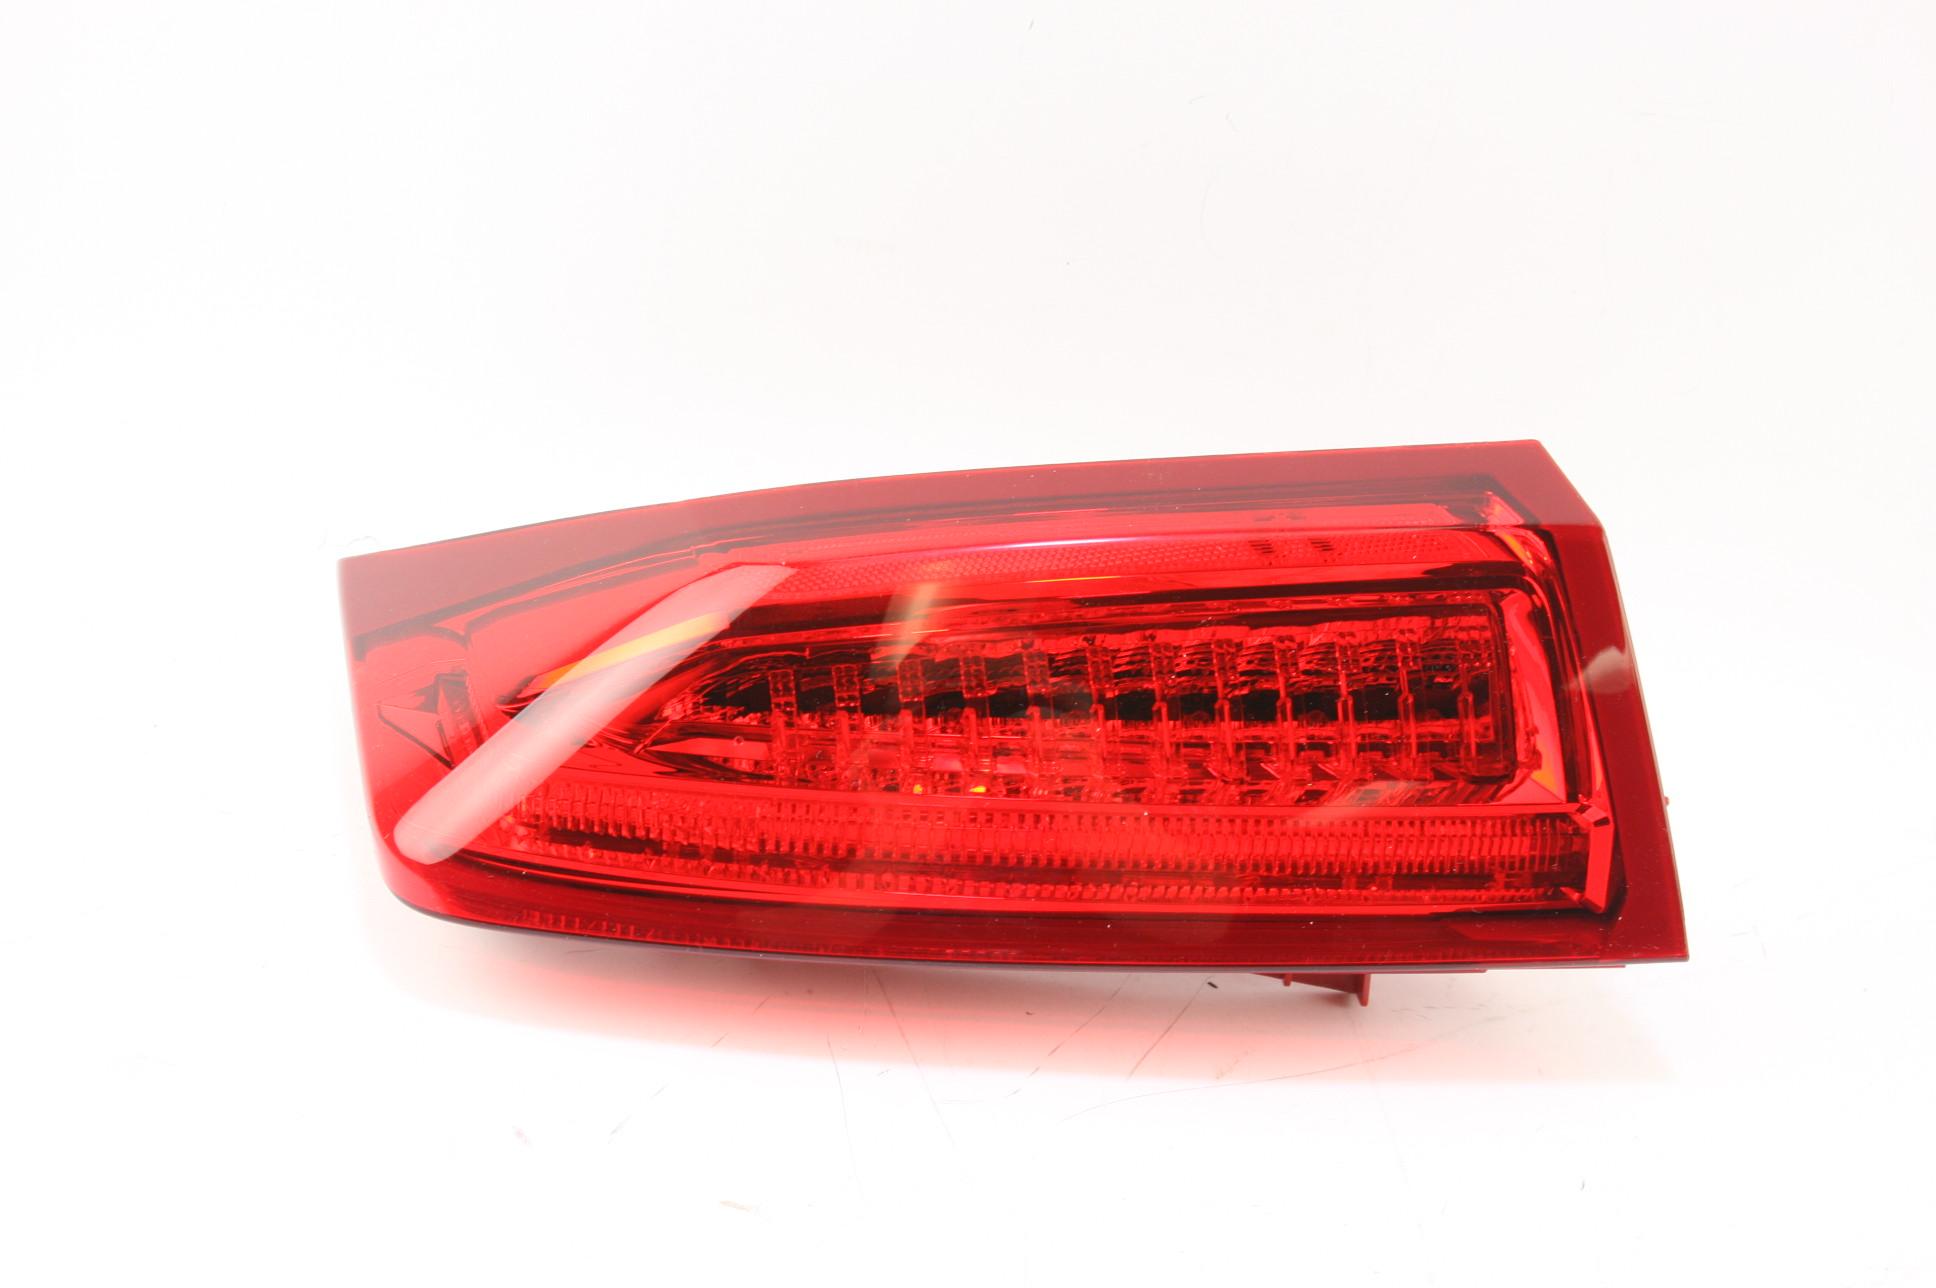 New OEM 84081570 Genuine GM 13-18 Cadillac ATS Sedan Tail Light Passenger Side - image 1